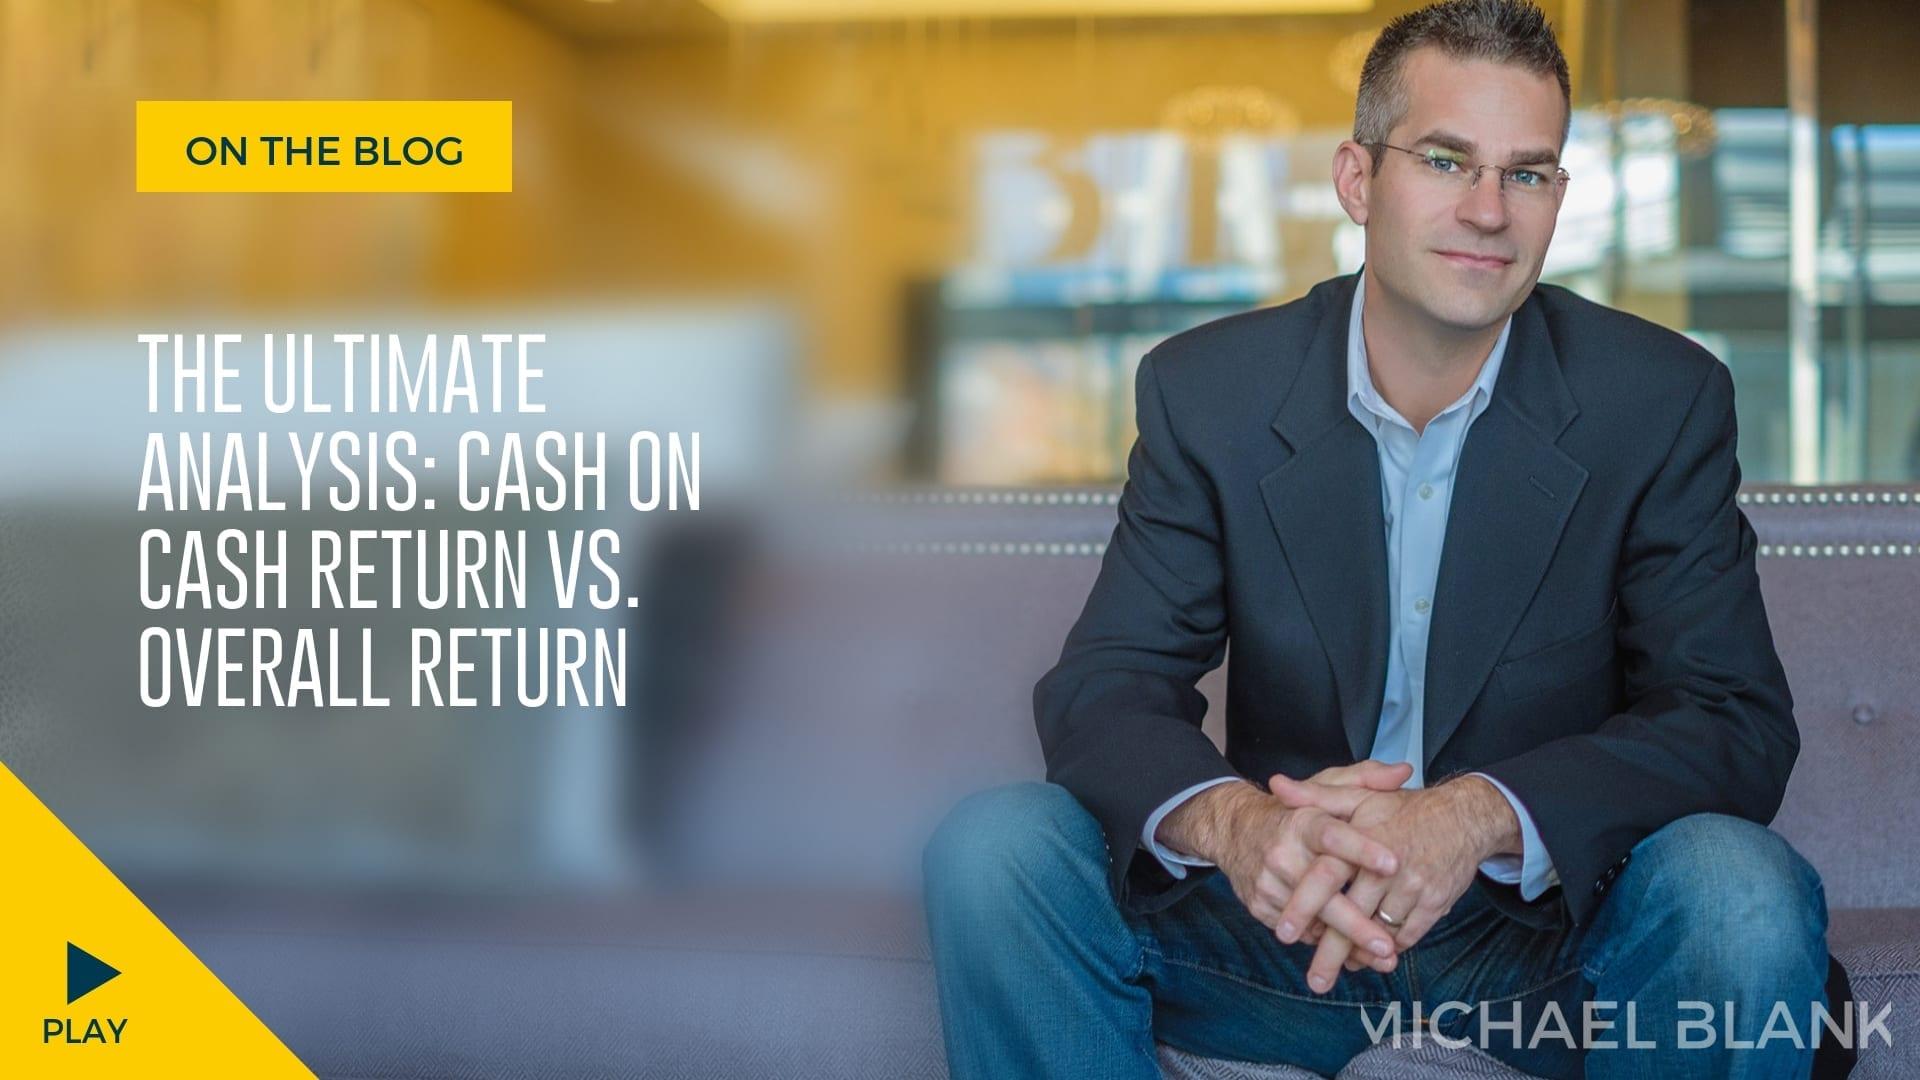 The Ultimate Analysis: Cash on Cash Return vs  Overall Return